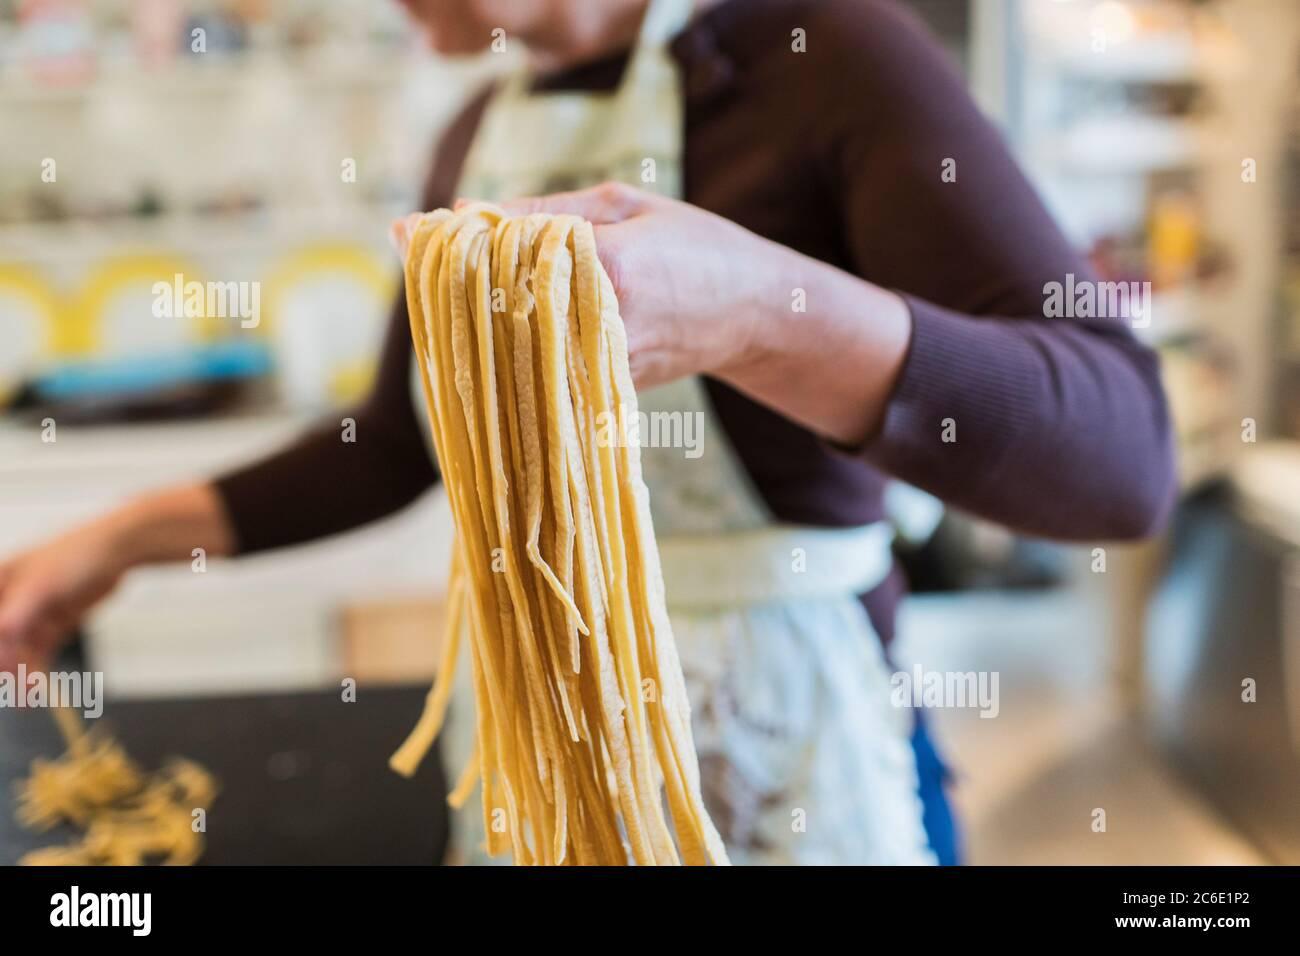 Woman making fresh homemade pasta in kitchen Stock Photo